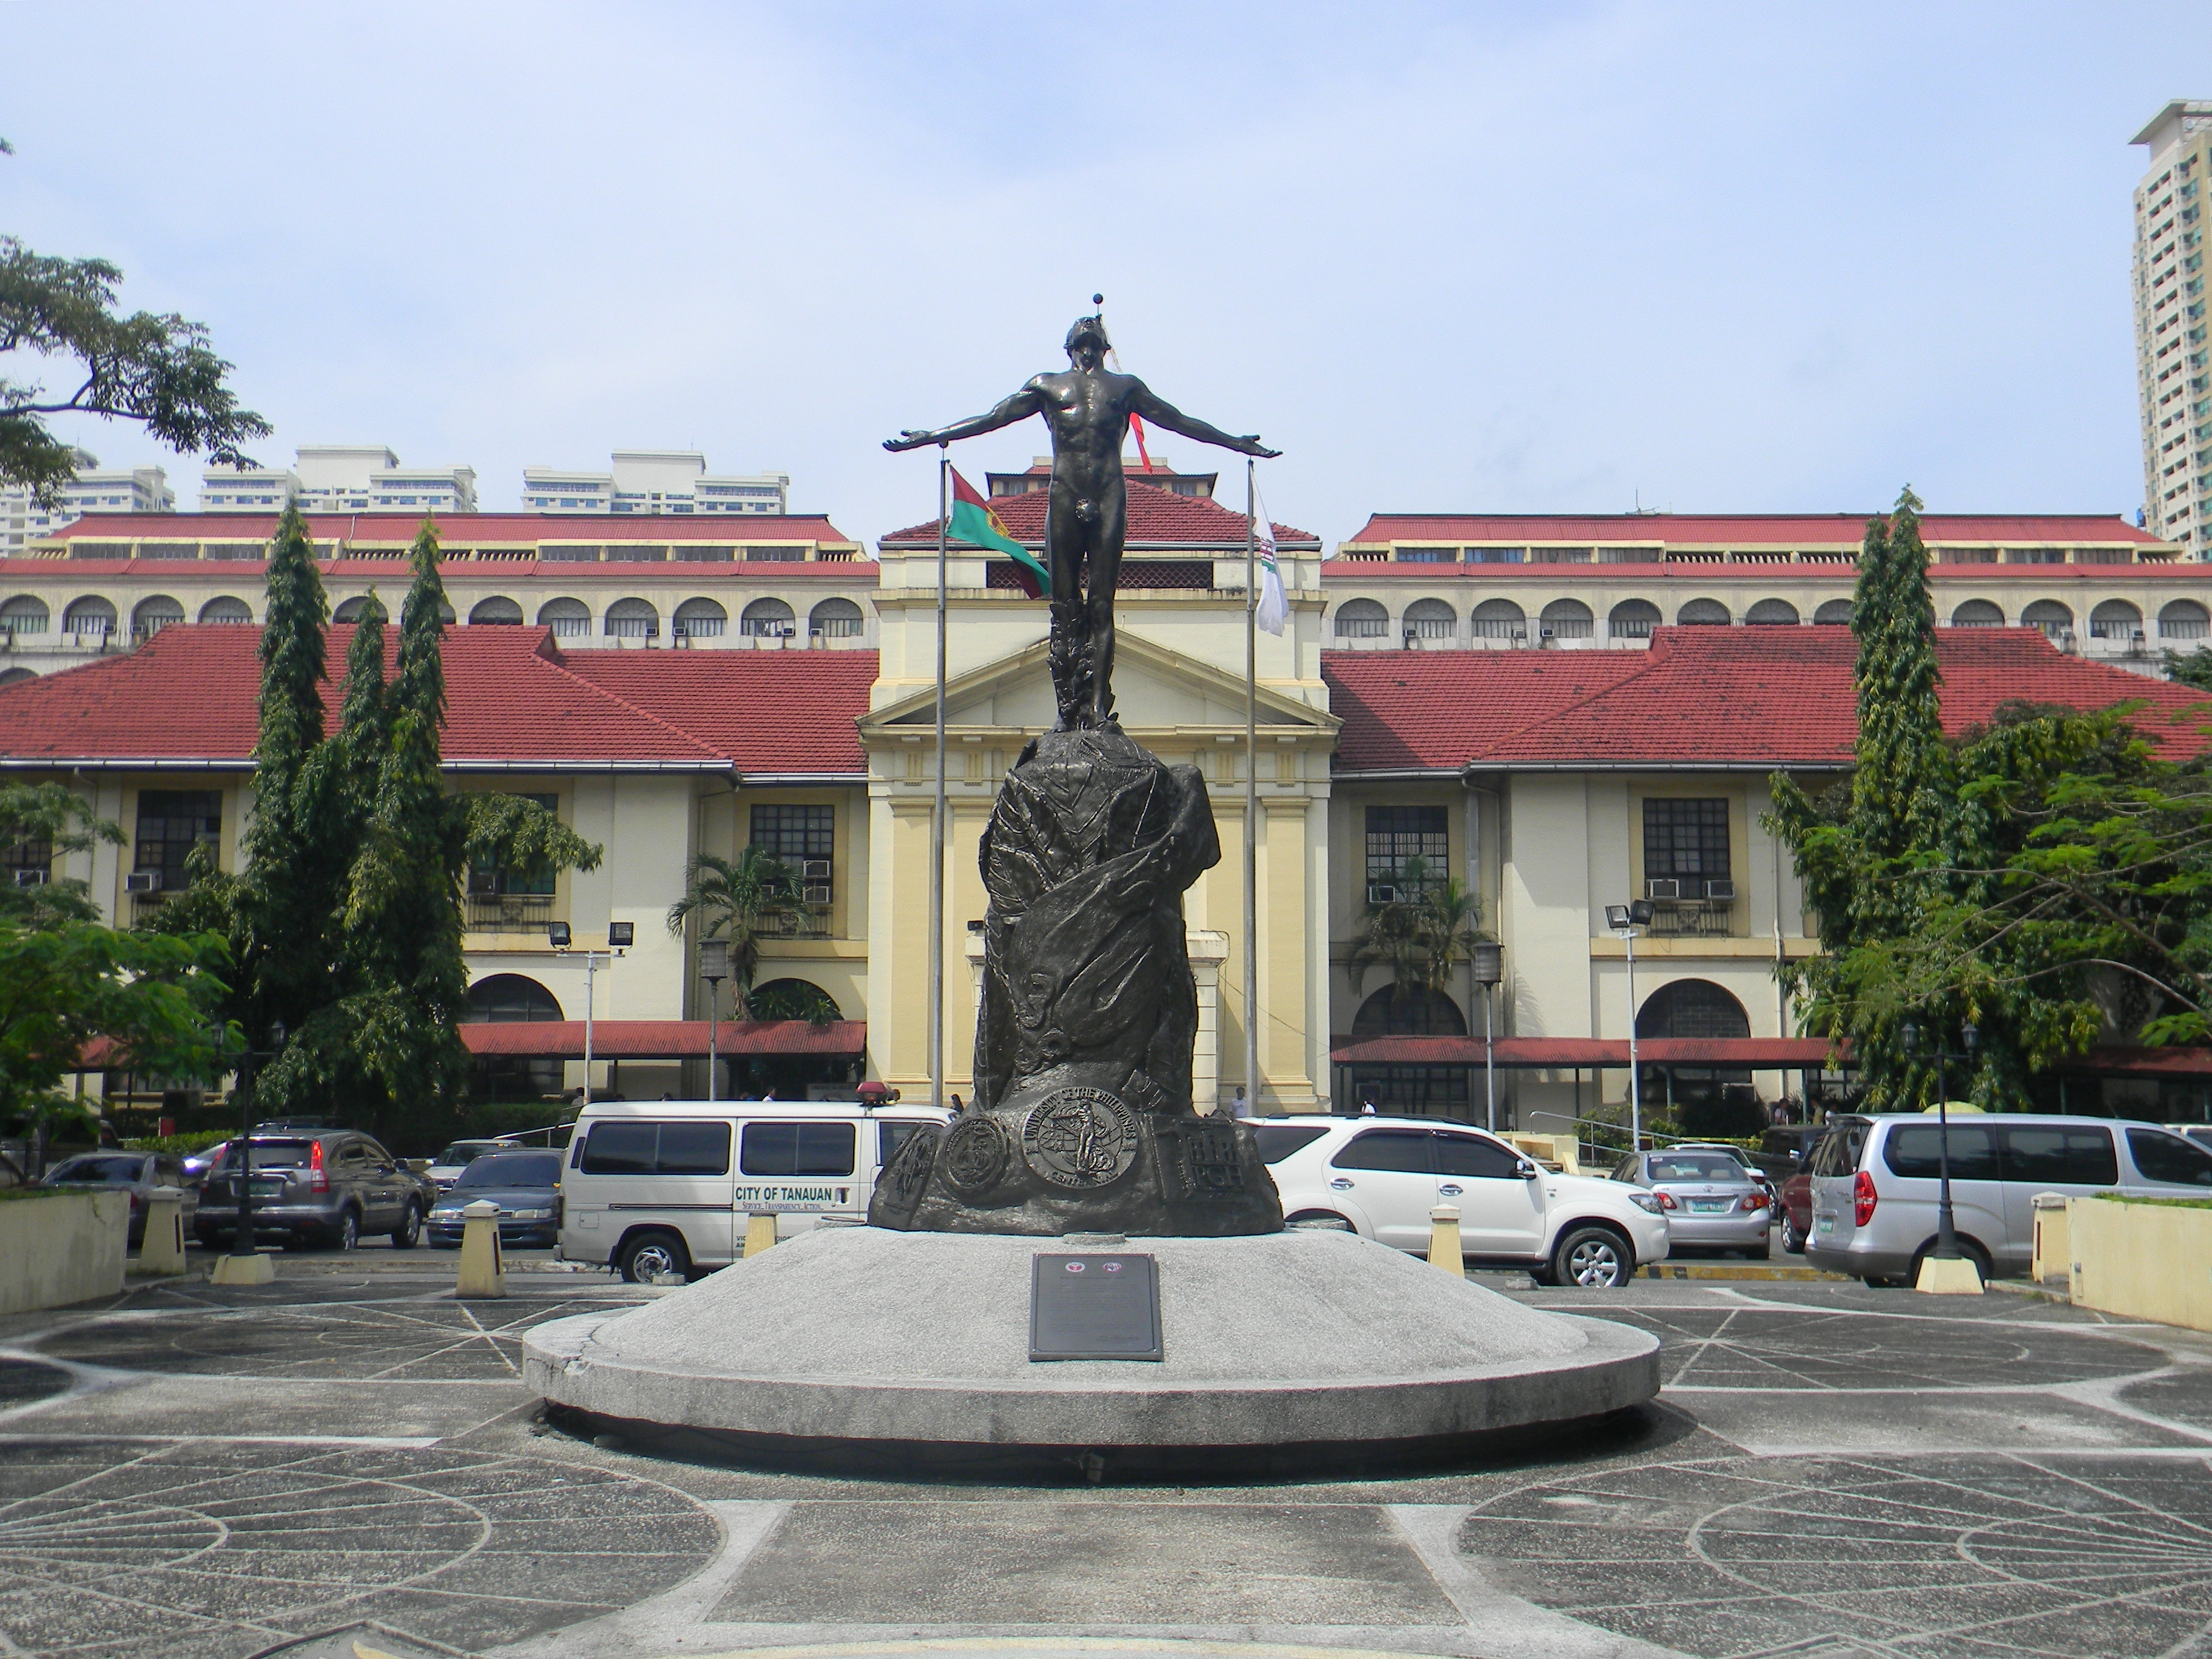 http://en.wikipedia.org/wiki/Philippine_General_Hospital